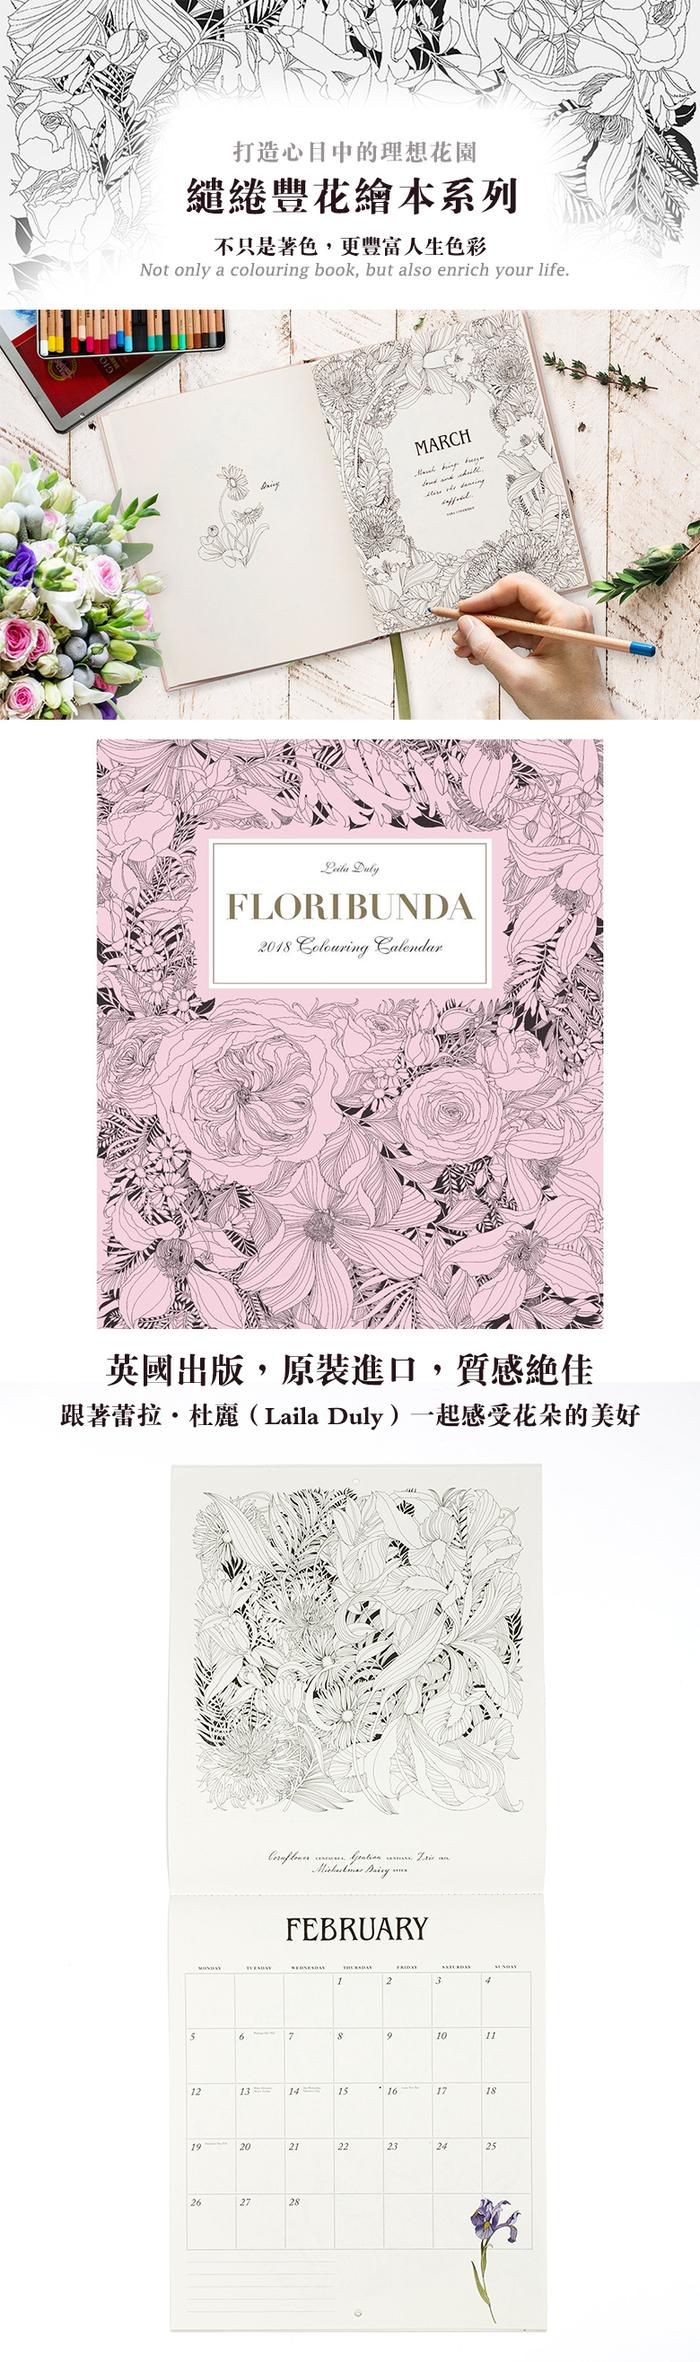 Laurence King|Floribunda 繾綣豐花 - 2018月曆手繪本